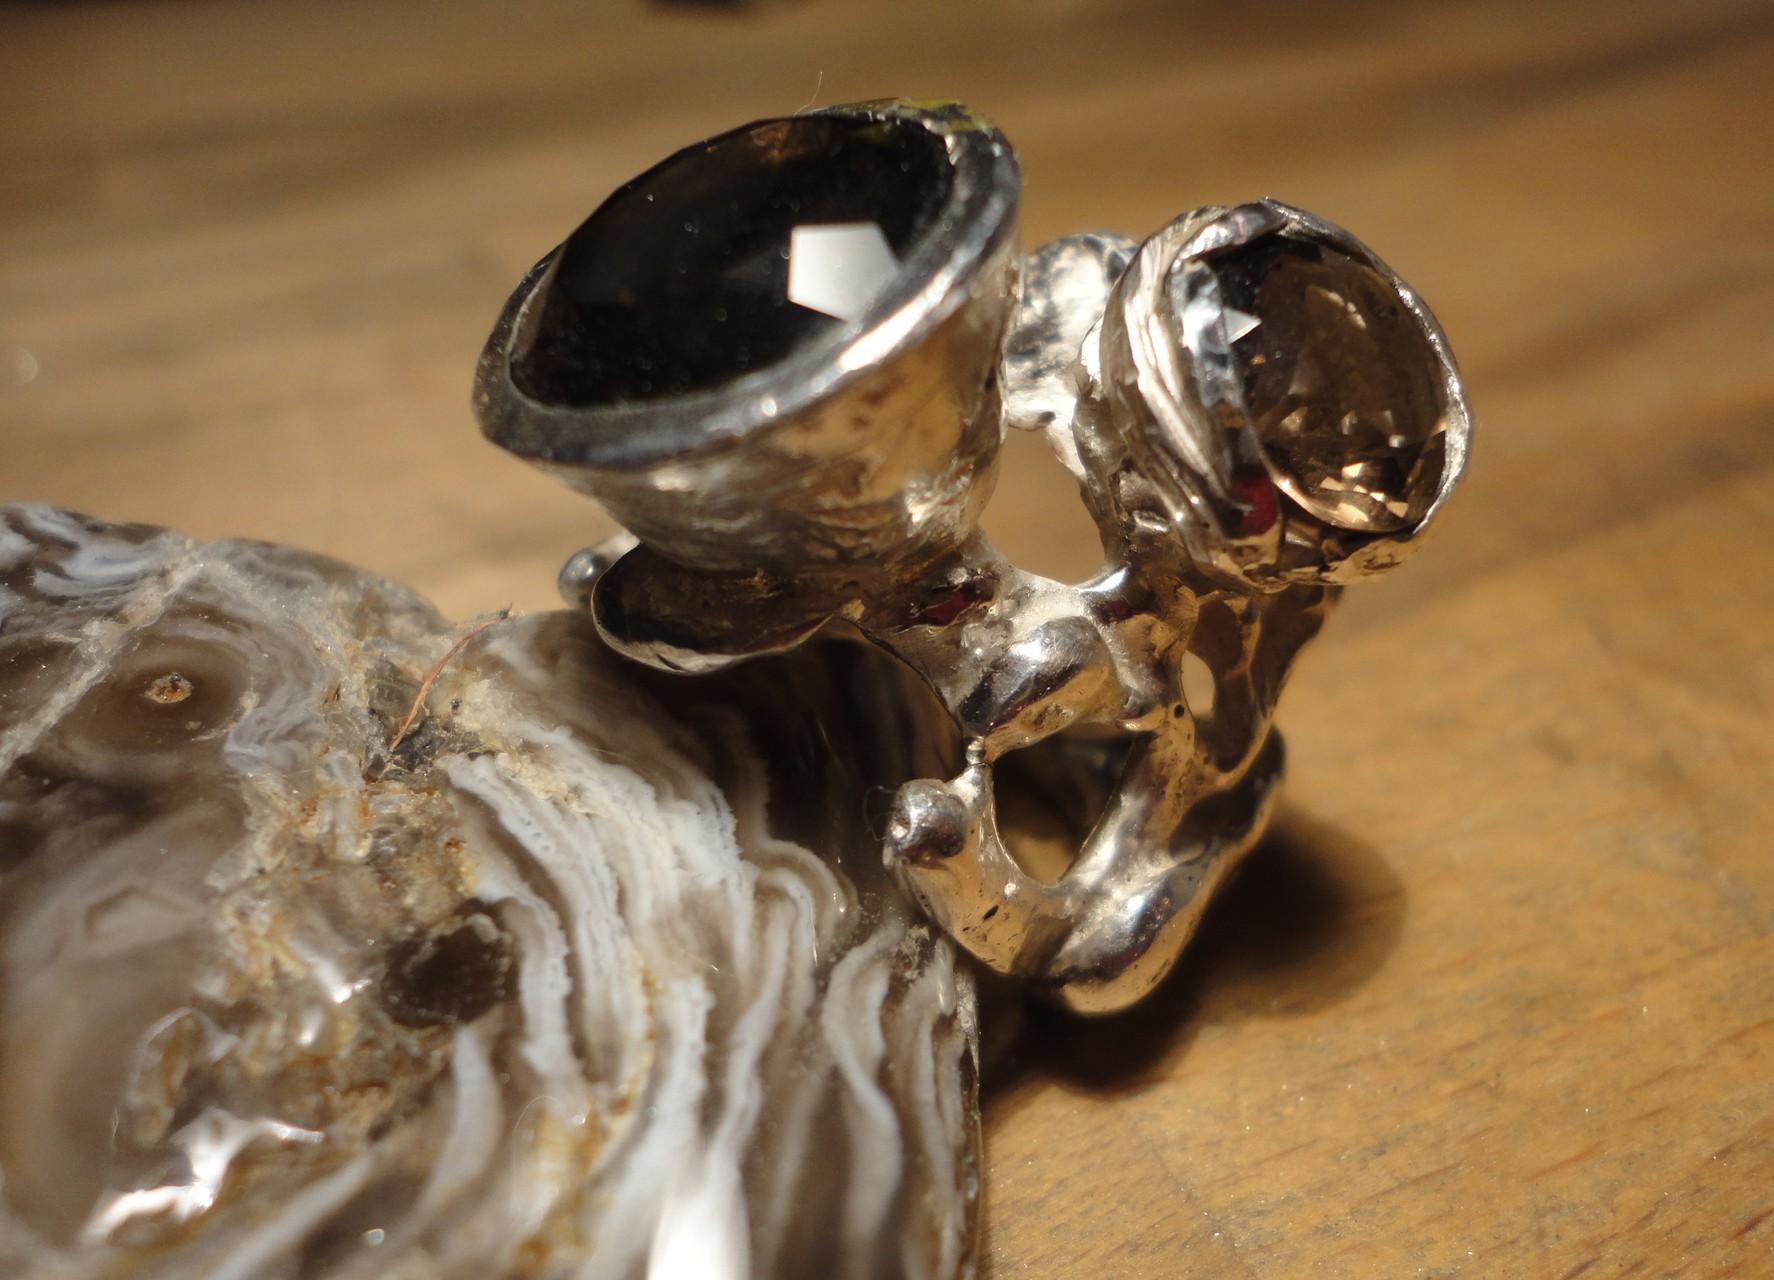 Silber-Nugget-Ring mit Rauchquarz-Blüten (925 Sterlingsilber) Preis: CHF 300.-